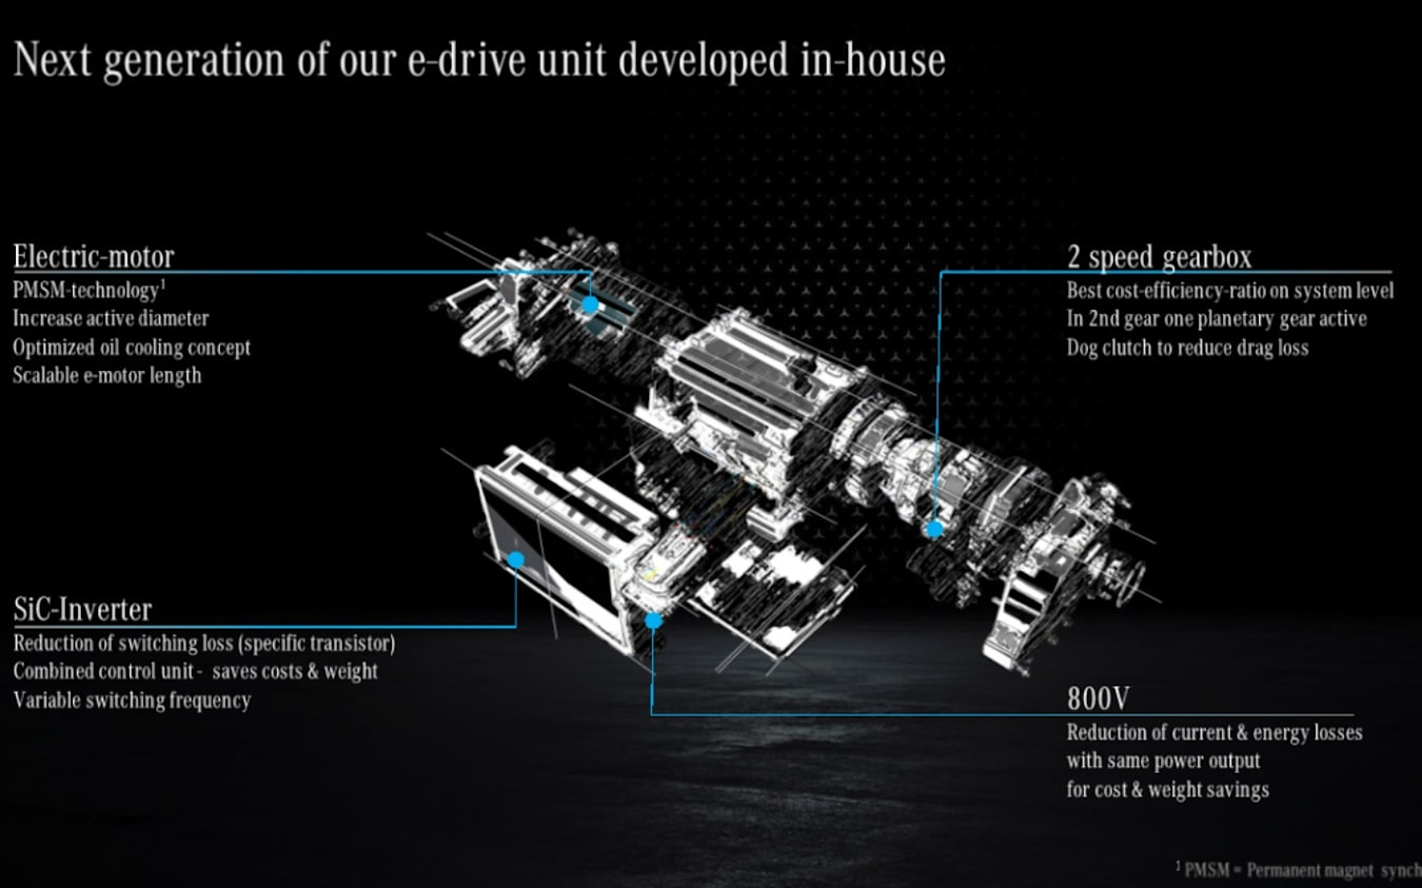 Mercedes EQ powertrain